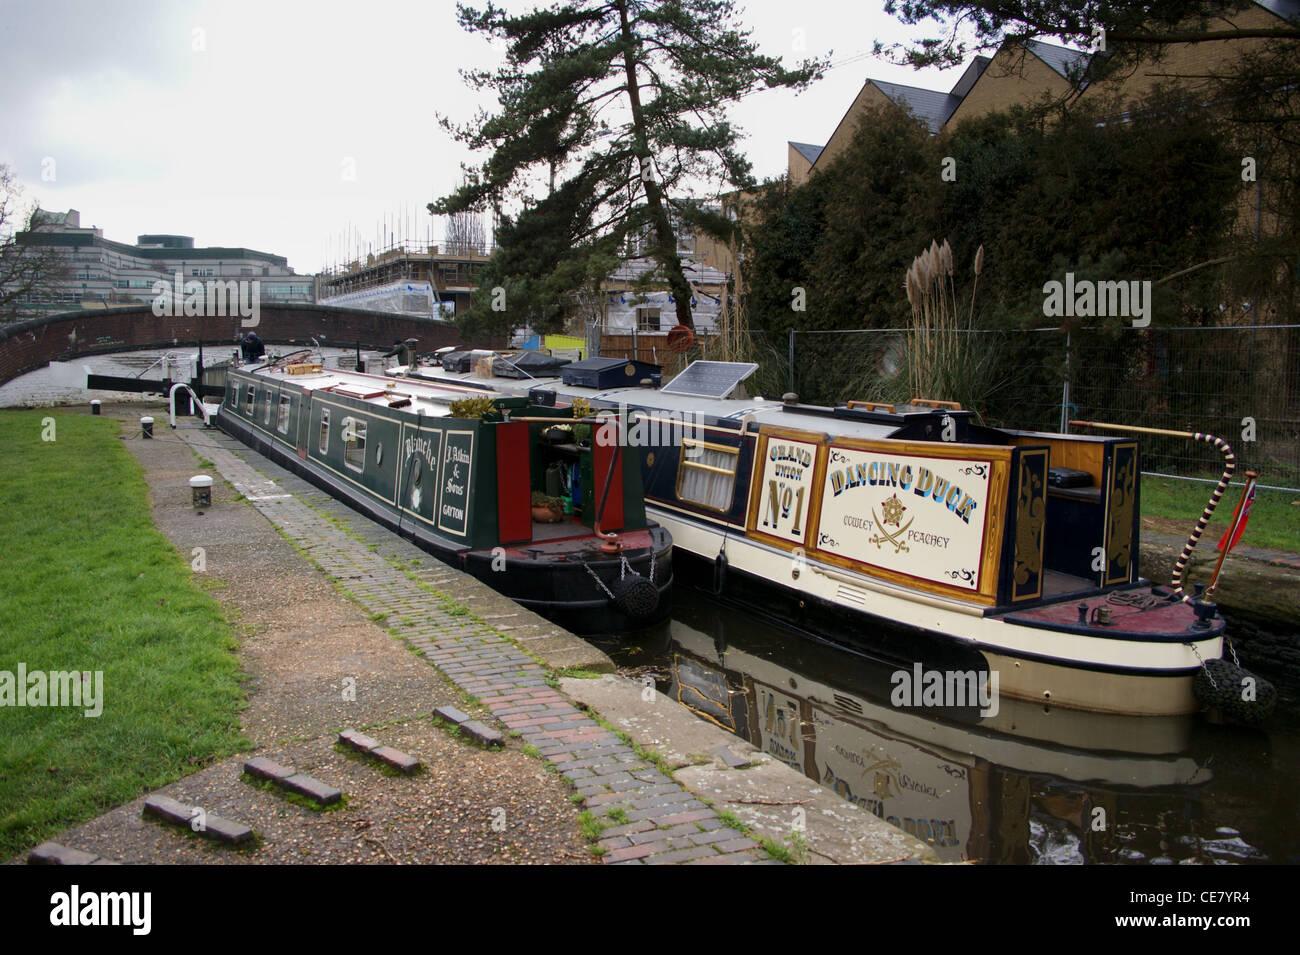 Narrowboats going down Uxbridge Lock, Grand Union Canal, Uxbridge, Hillingdon, London, England - Stock Image